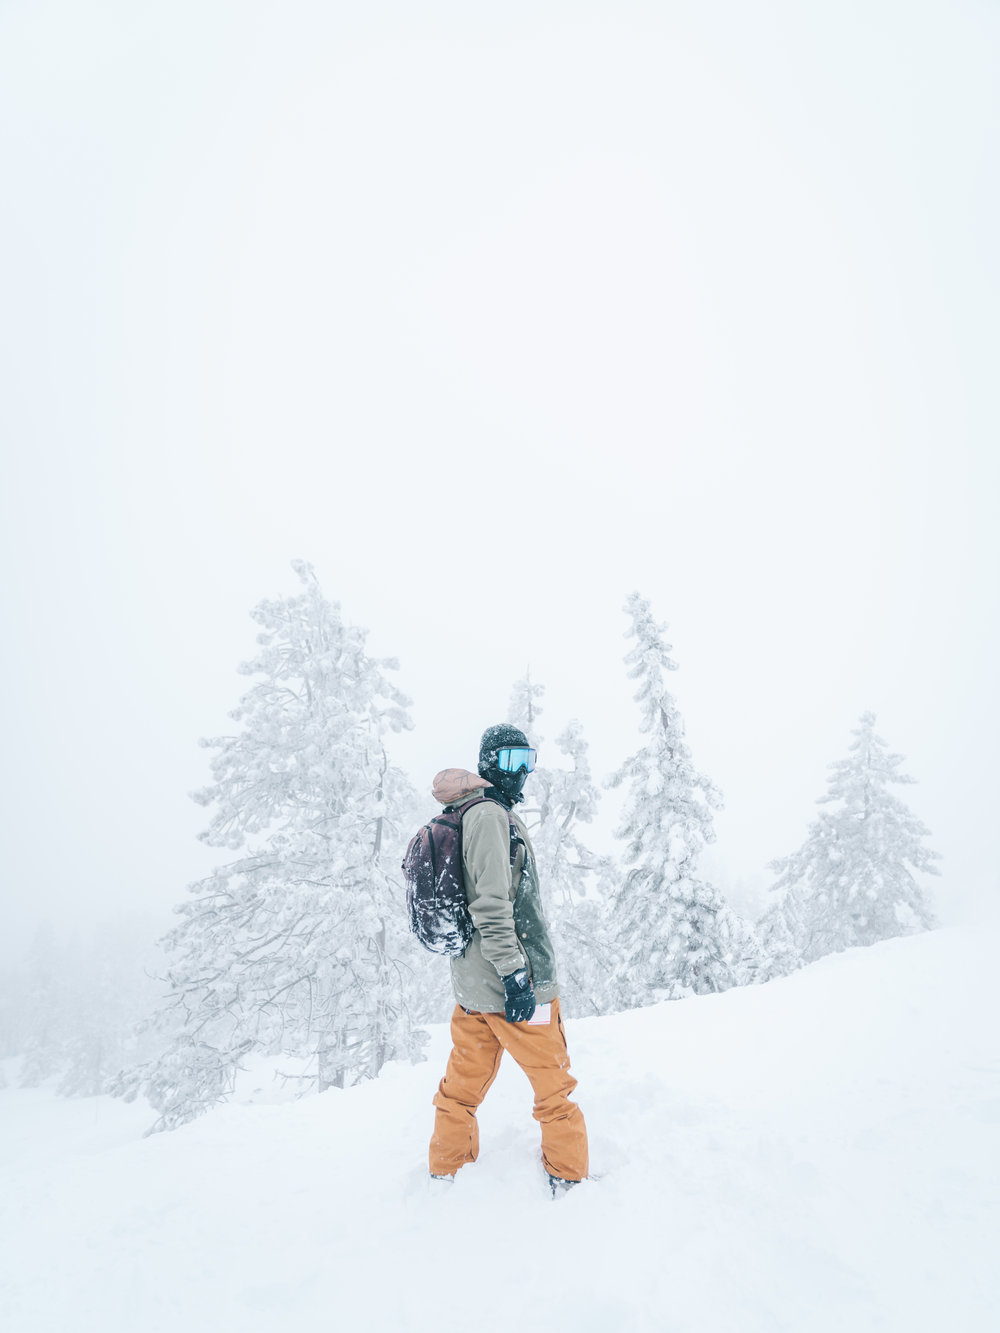 Bobby  |4.9.17| Lake Tahoe, California